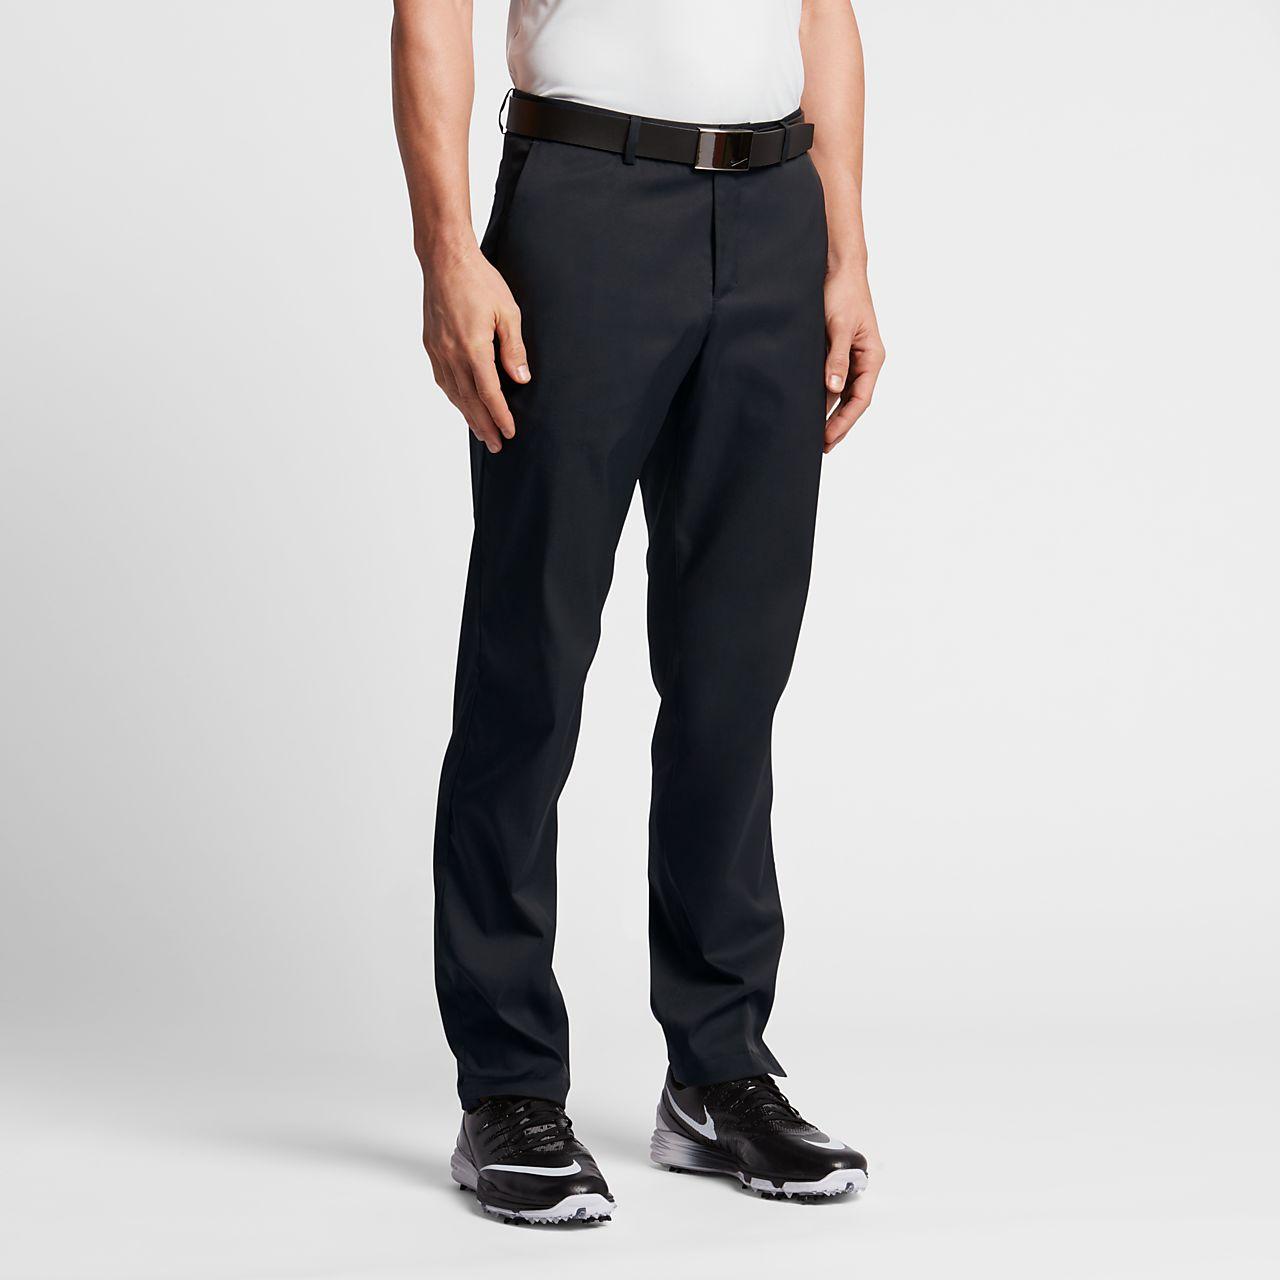 Pánské golfové kalhoty Nike Flat Front. Nike.com CZ e25fa691ff